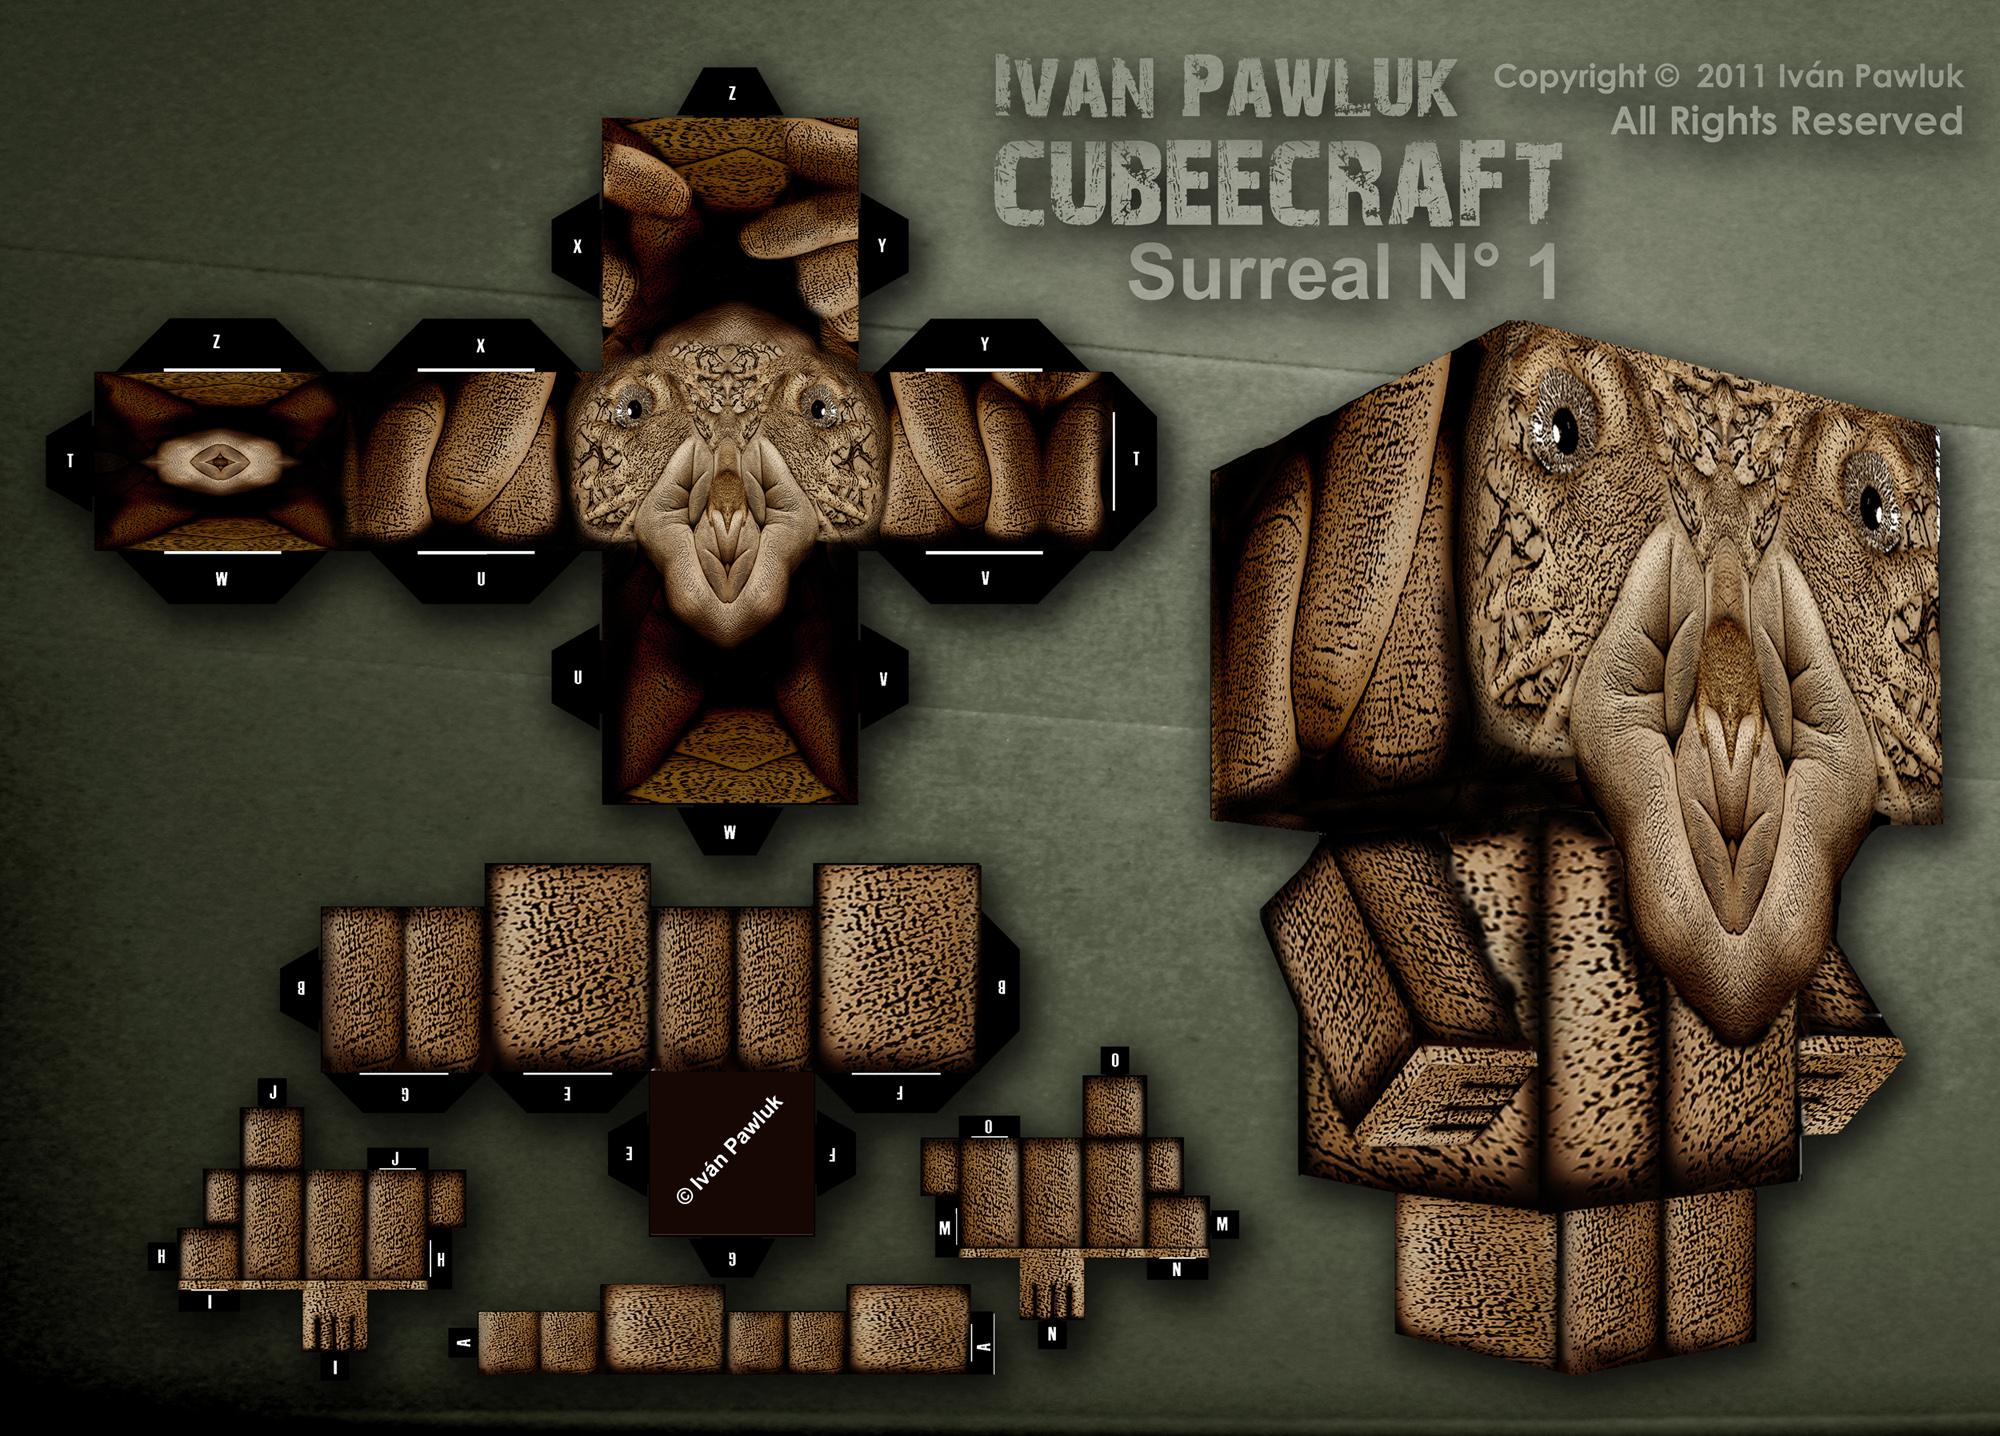 Cubeecraft Iván Pawluk (Surereal N° 1 )